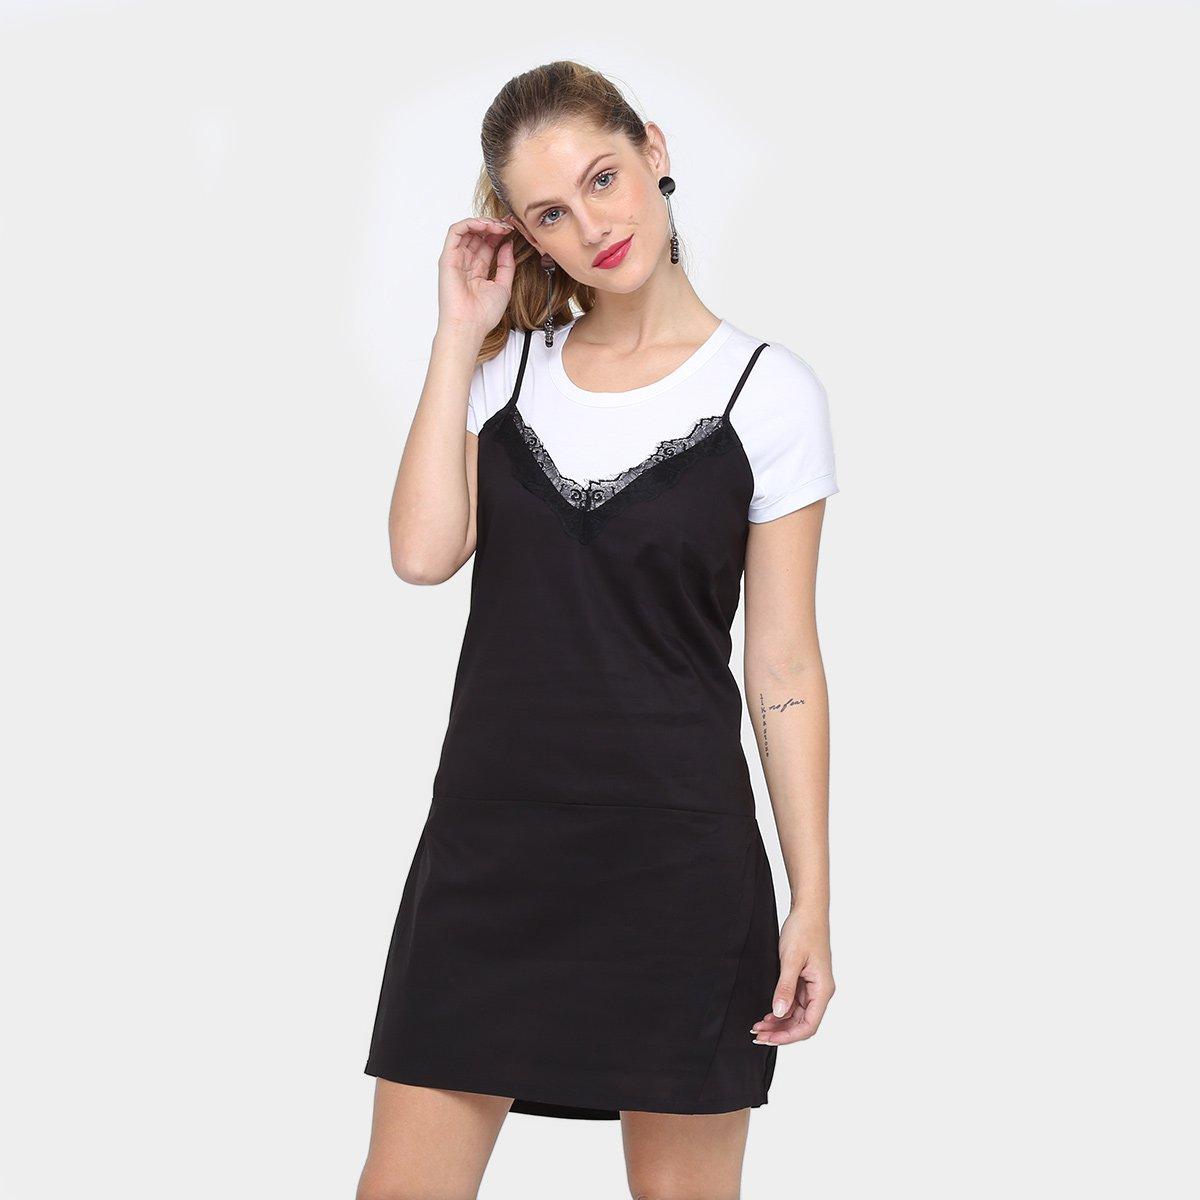 c88c5e8d2 Vestido Colcci Curto Sleep Dress Sobreposto